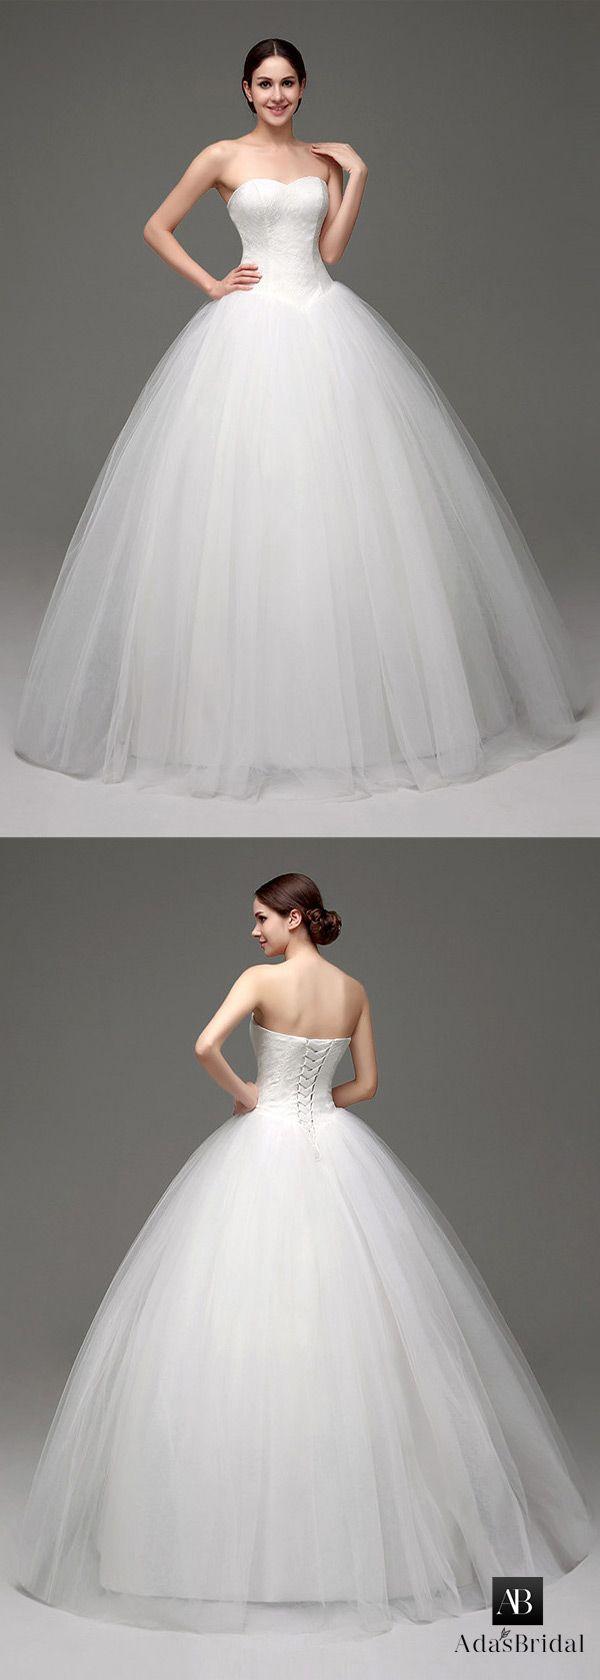 Best wedding dresses for 50 year olds   best Wedding dress images on Pinterest  Short wedding gowns